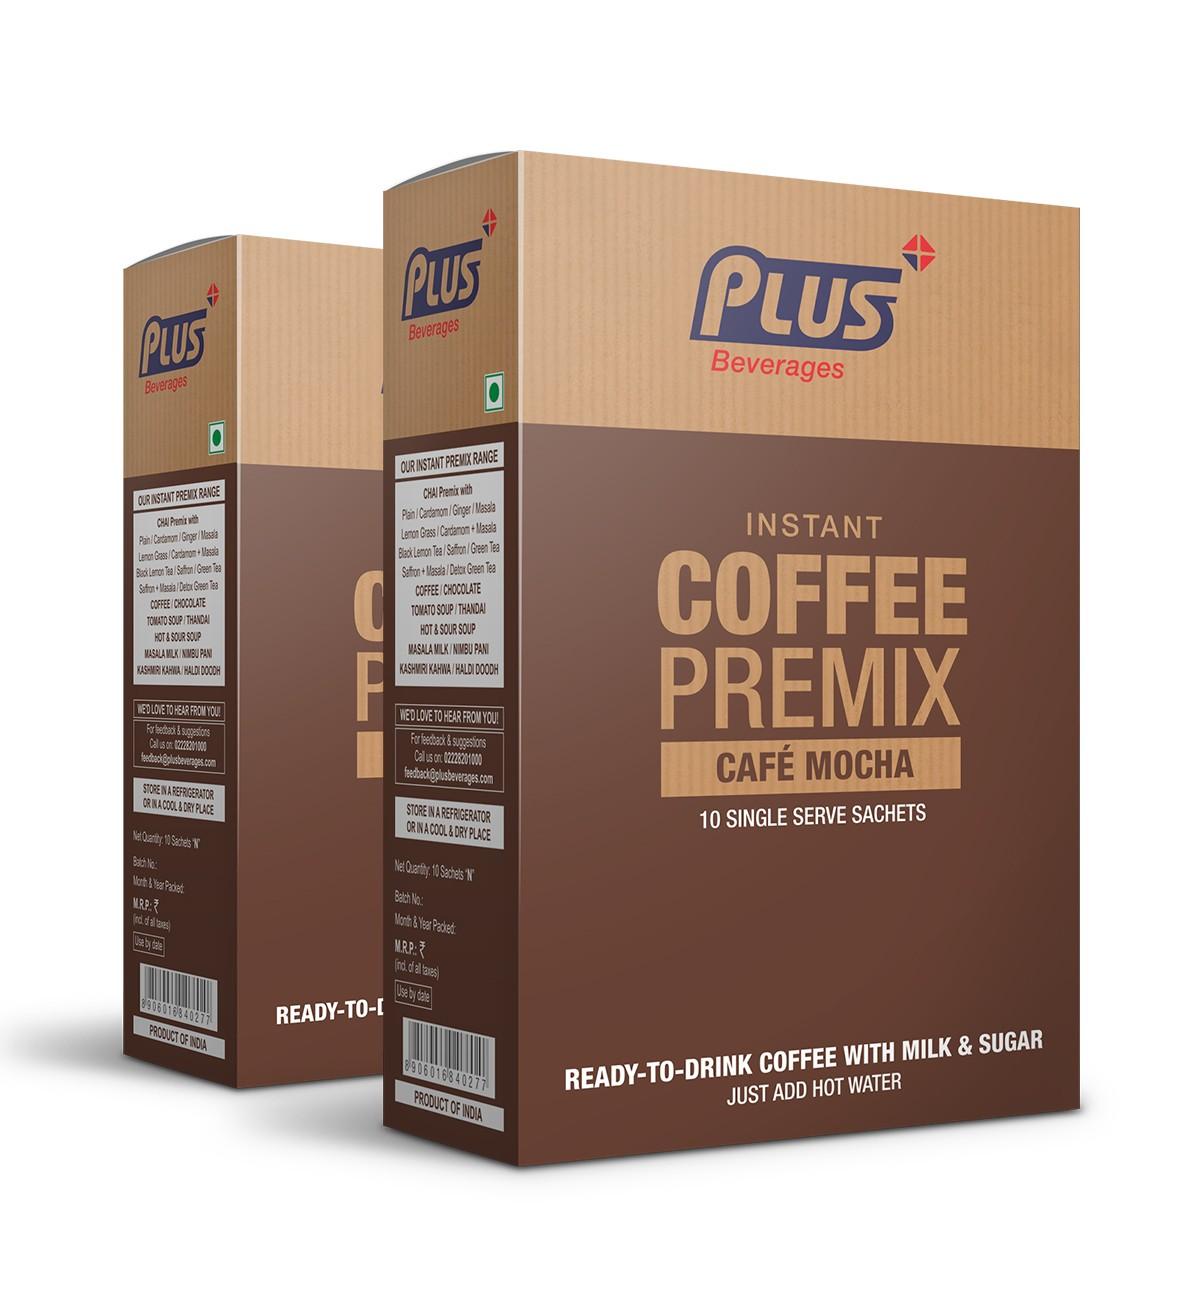 Get Instant Café Mochha Premix at best price - Free Shipping | Plus Beverages